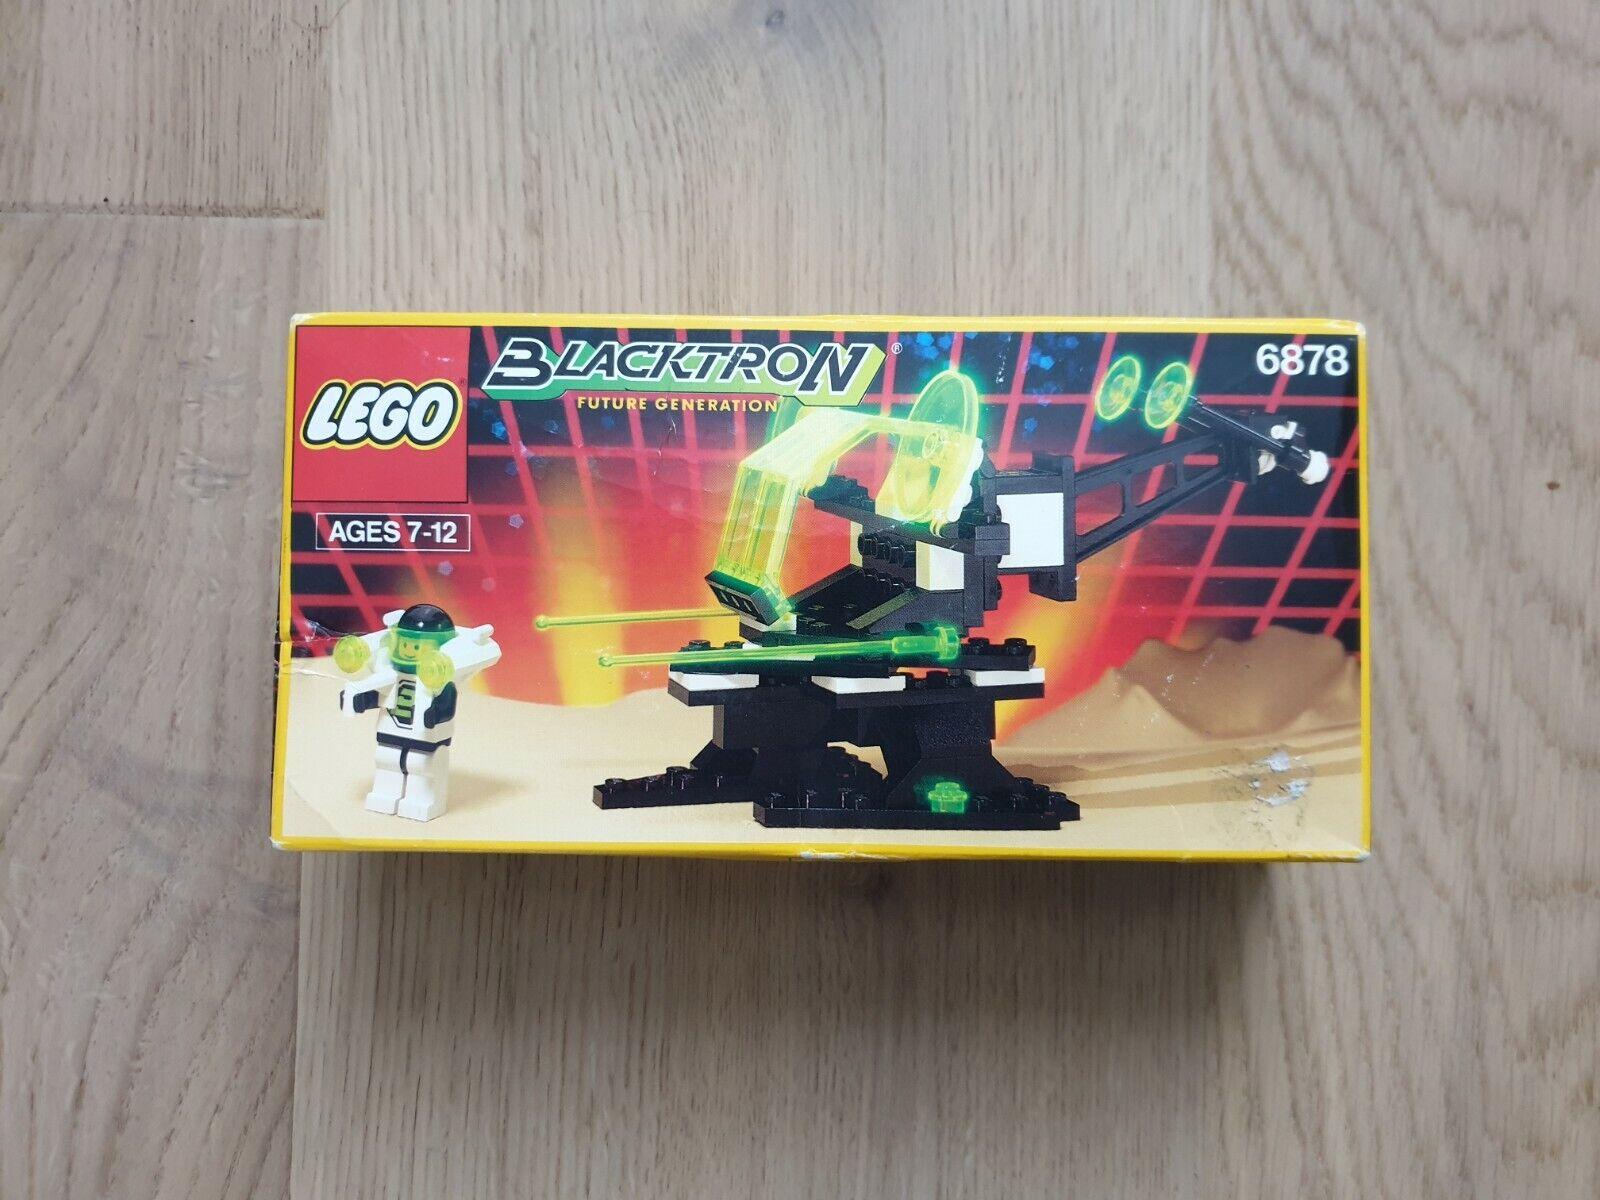 NOS LEGO 6878 schwarzTRON II VINTAGE COLLECTIBLE (1991) SUB ORBITAL GUARDIAN